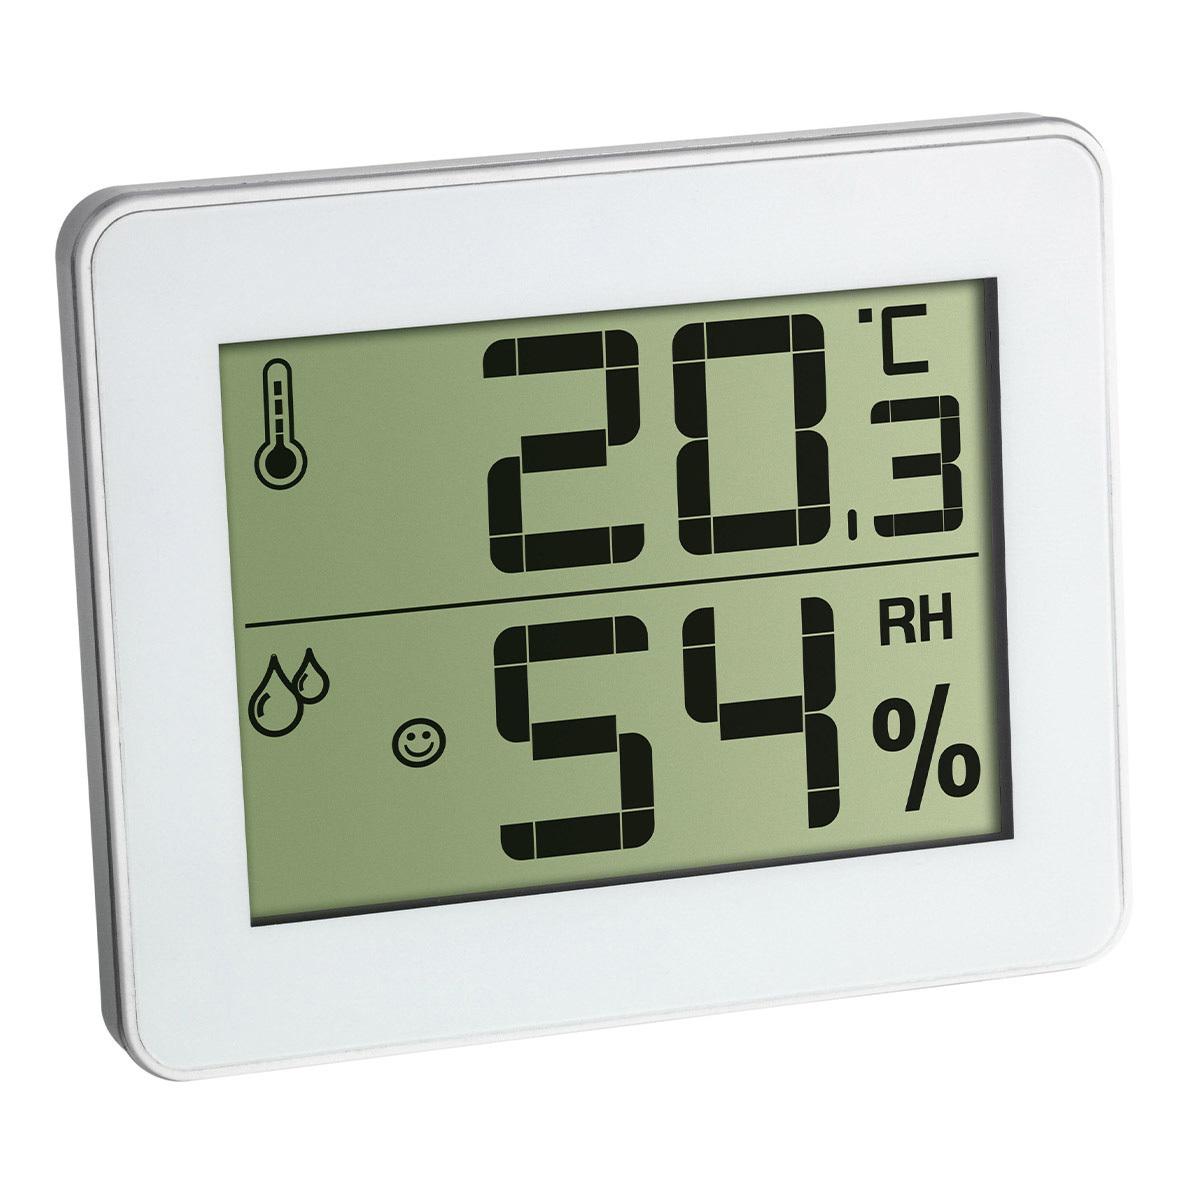 30-5027-02-digitales-thermo-hygrometer-1200x1200px.jpg